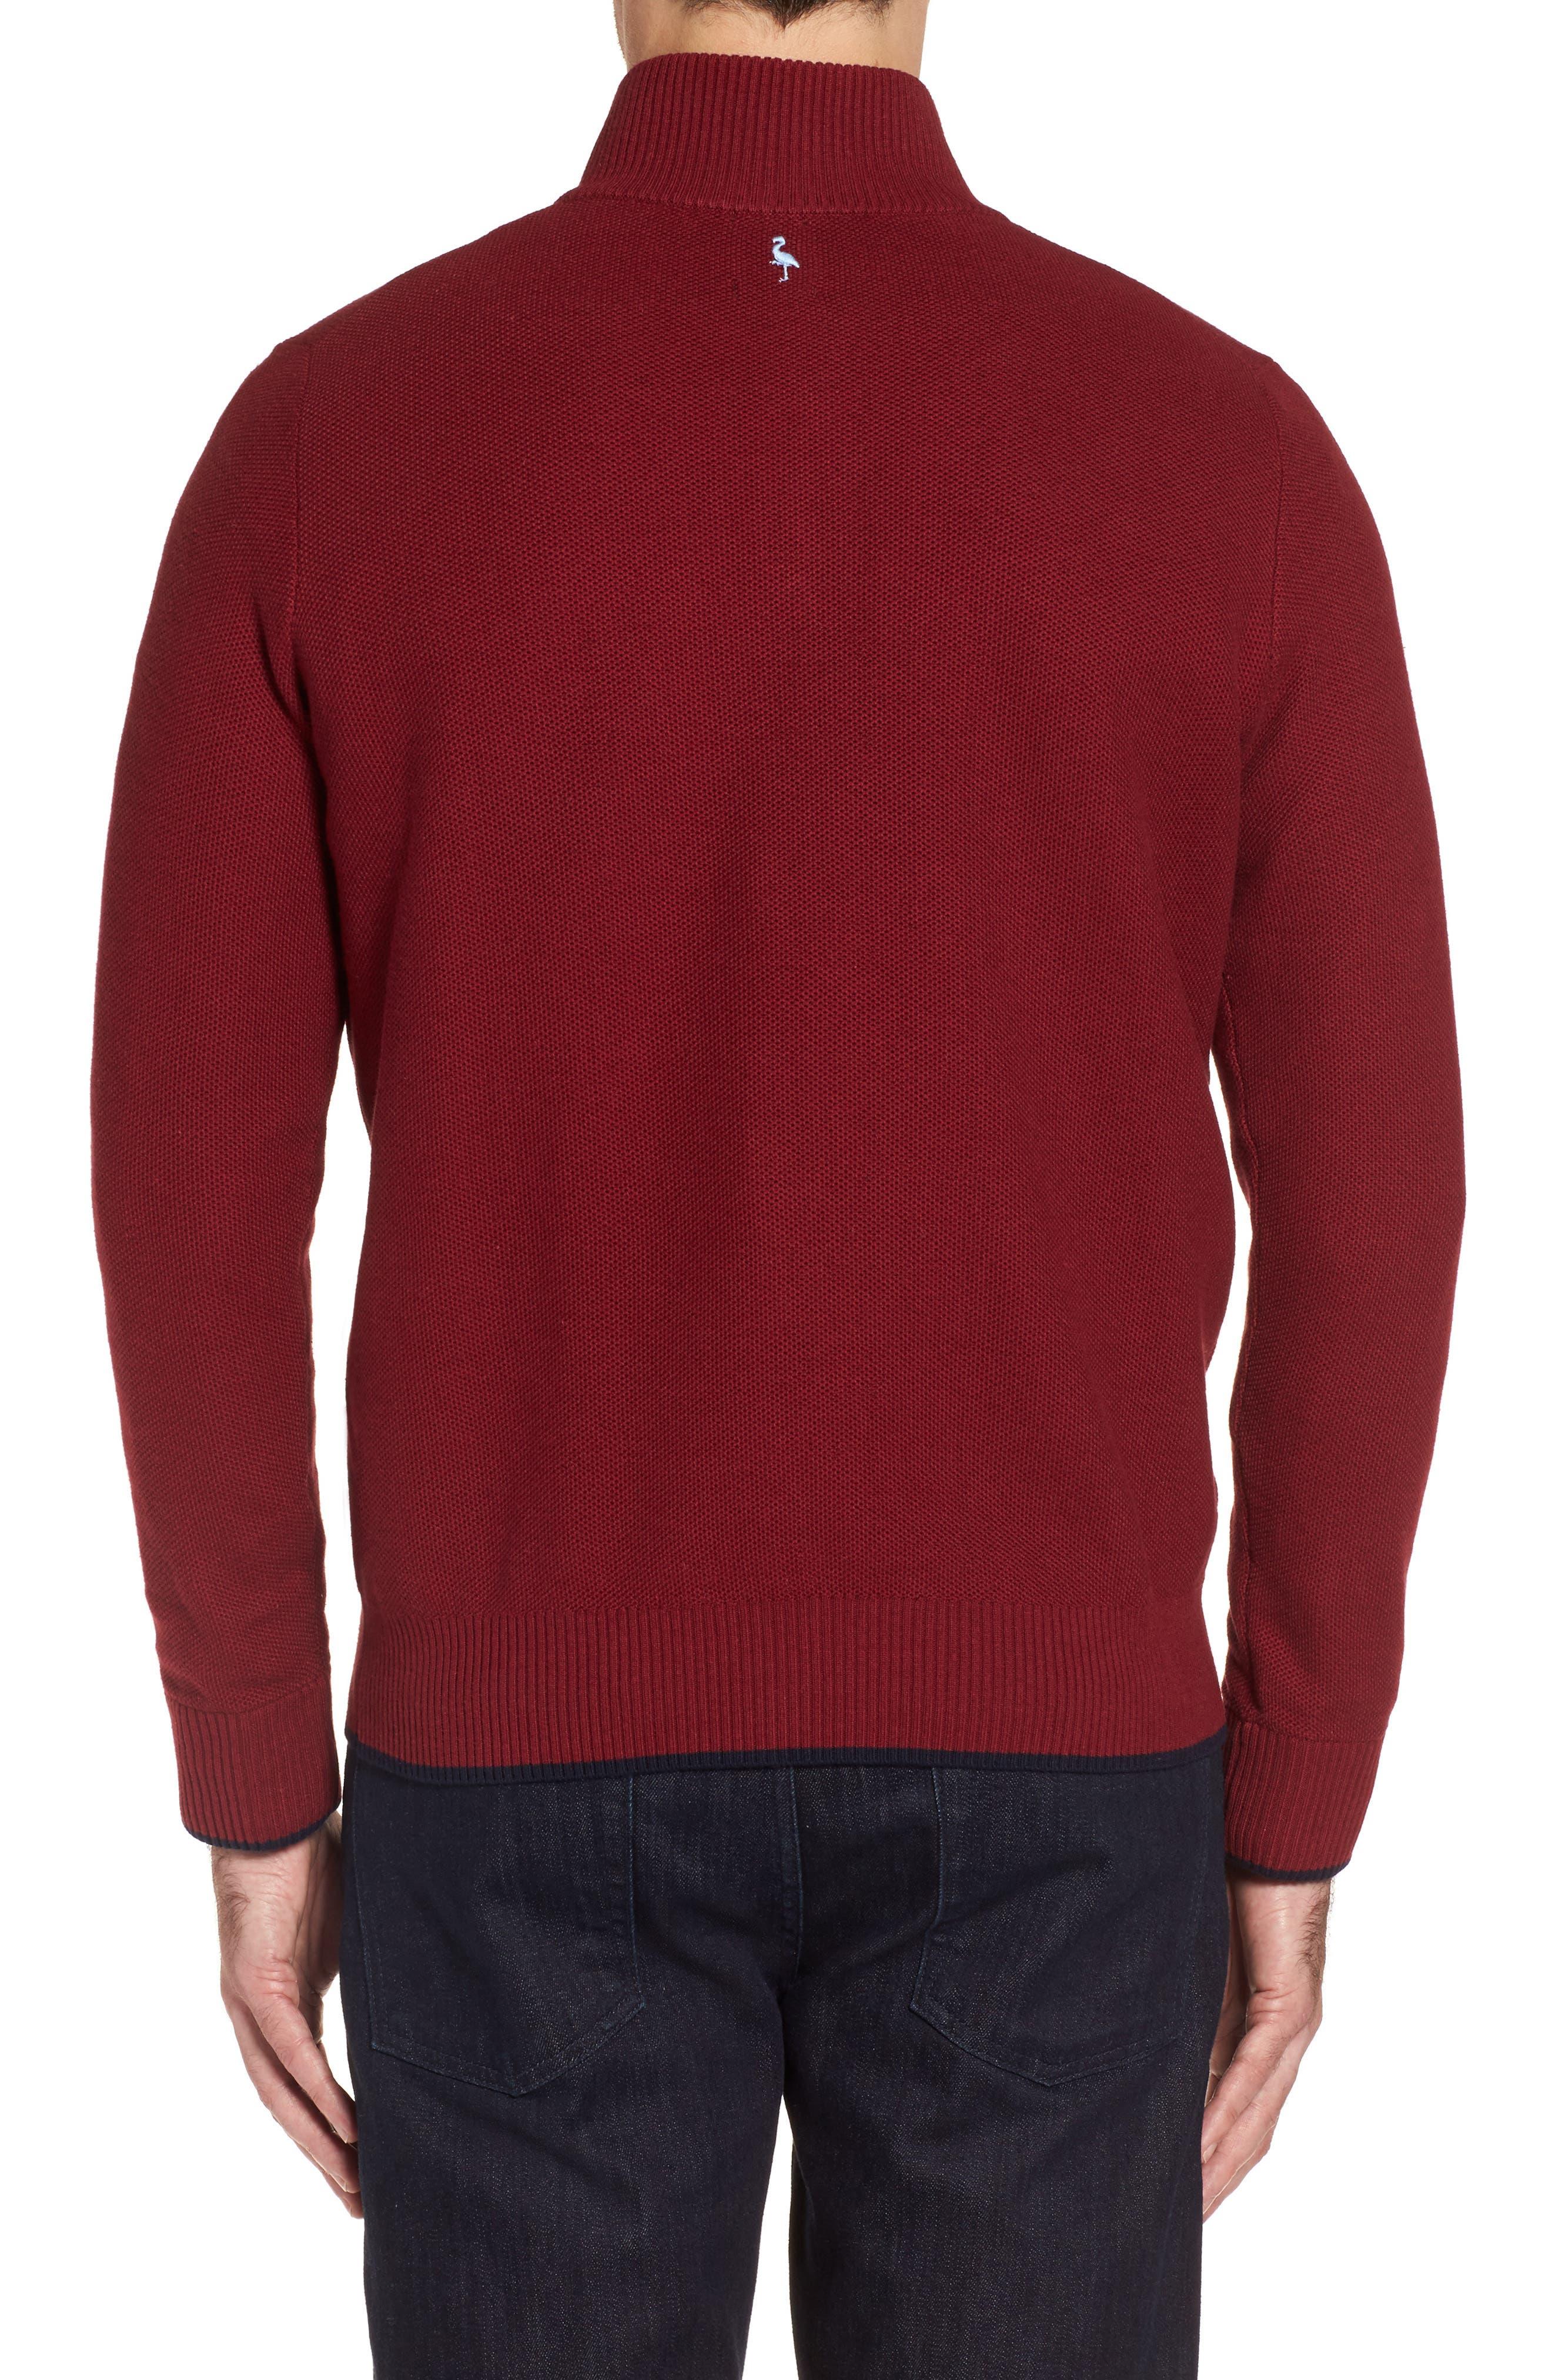 Prien Tipped Quarter Zip Sweater,                             Alternate thumbnail 2, color,                             600